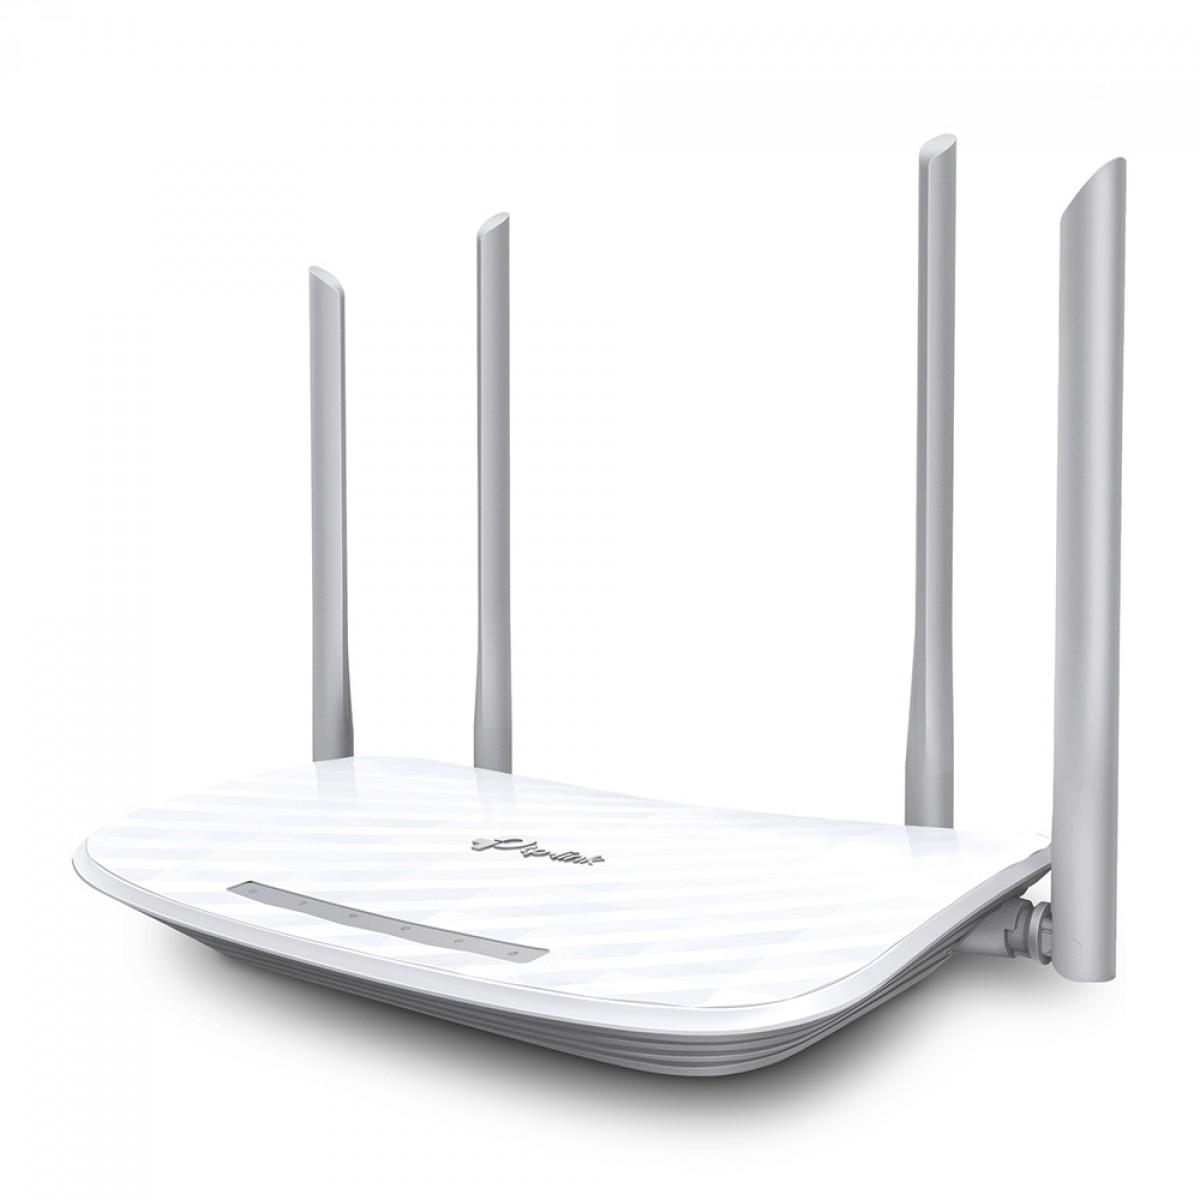 Roteador Wireless N TP-LINK Archer 5 W, Gigabit Dual Band AC1200